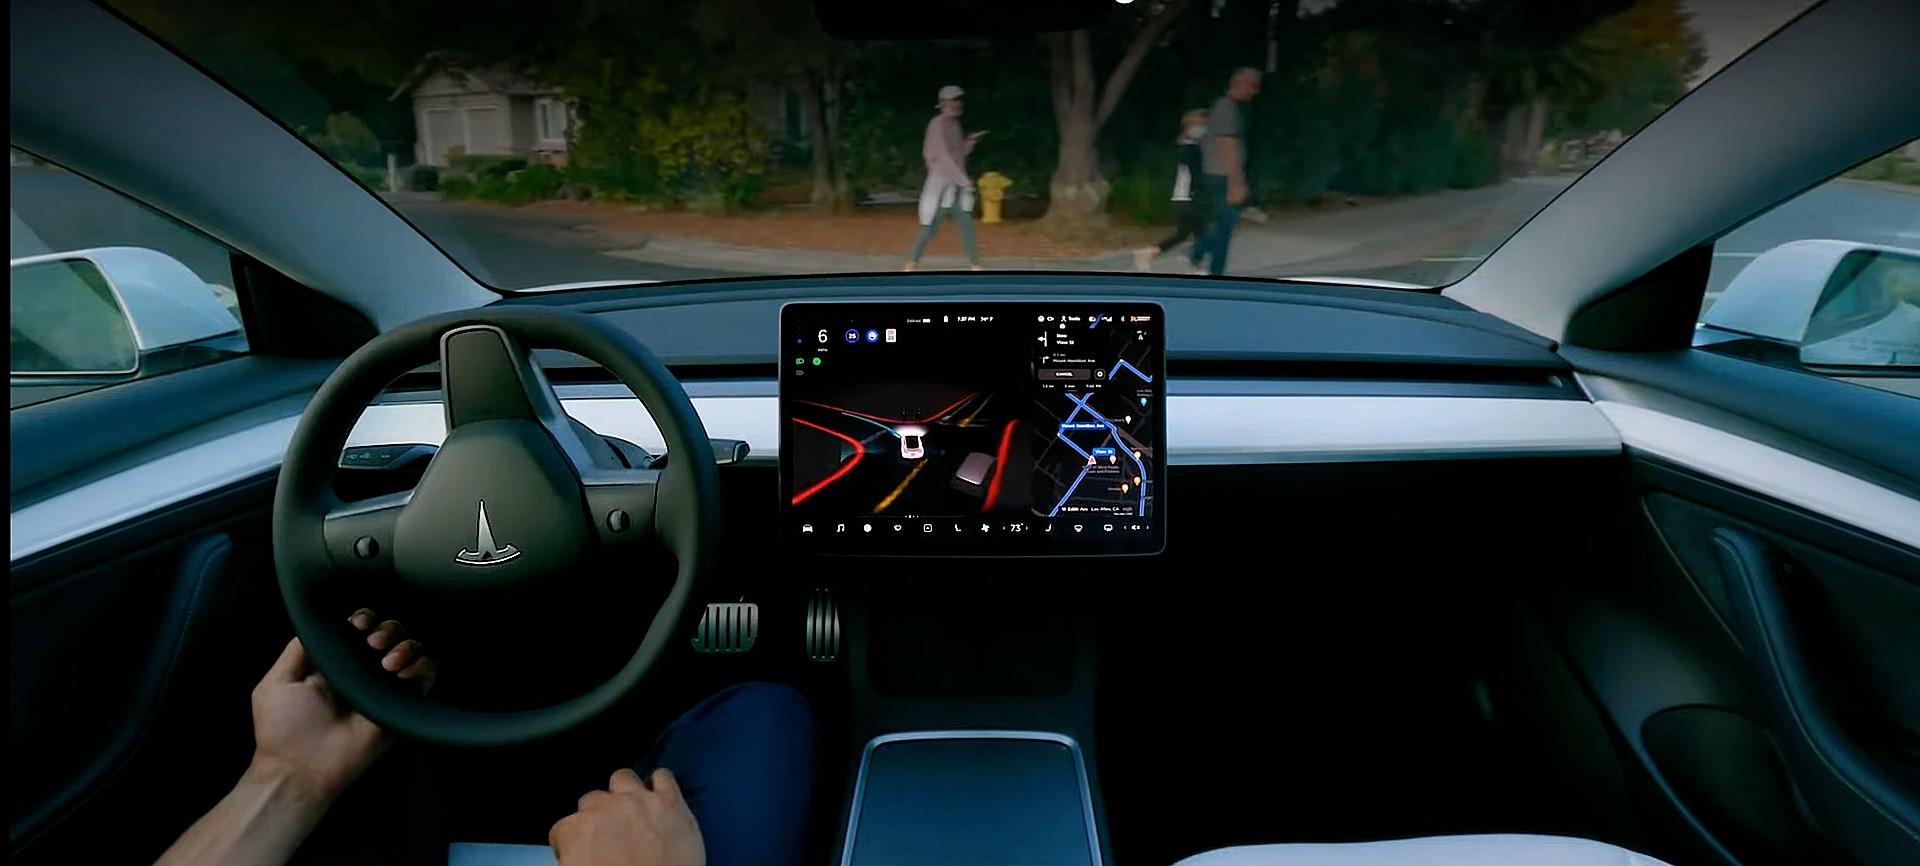 Tesla's Elon Musk posts update on FSD Beta 10's release date